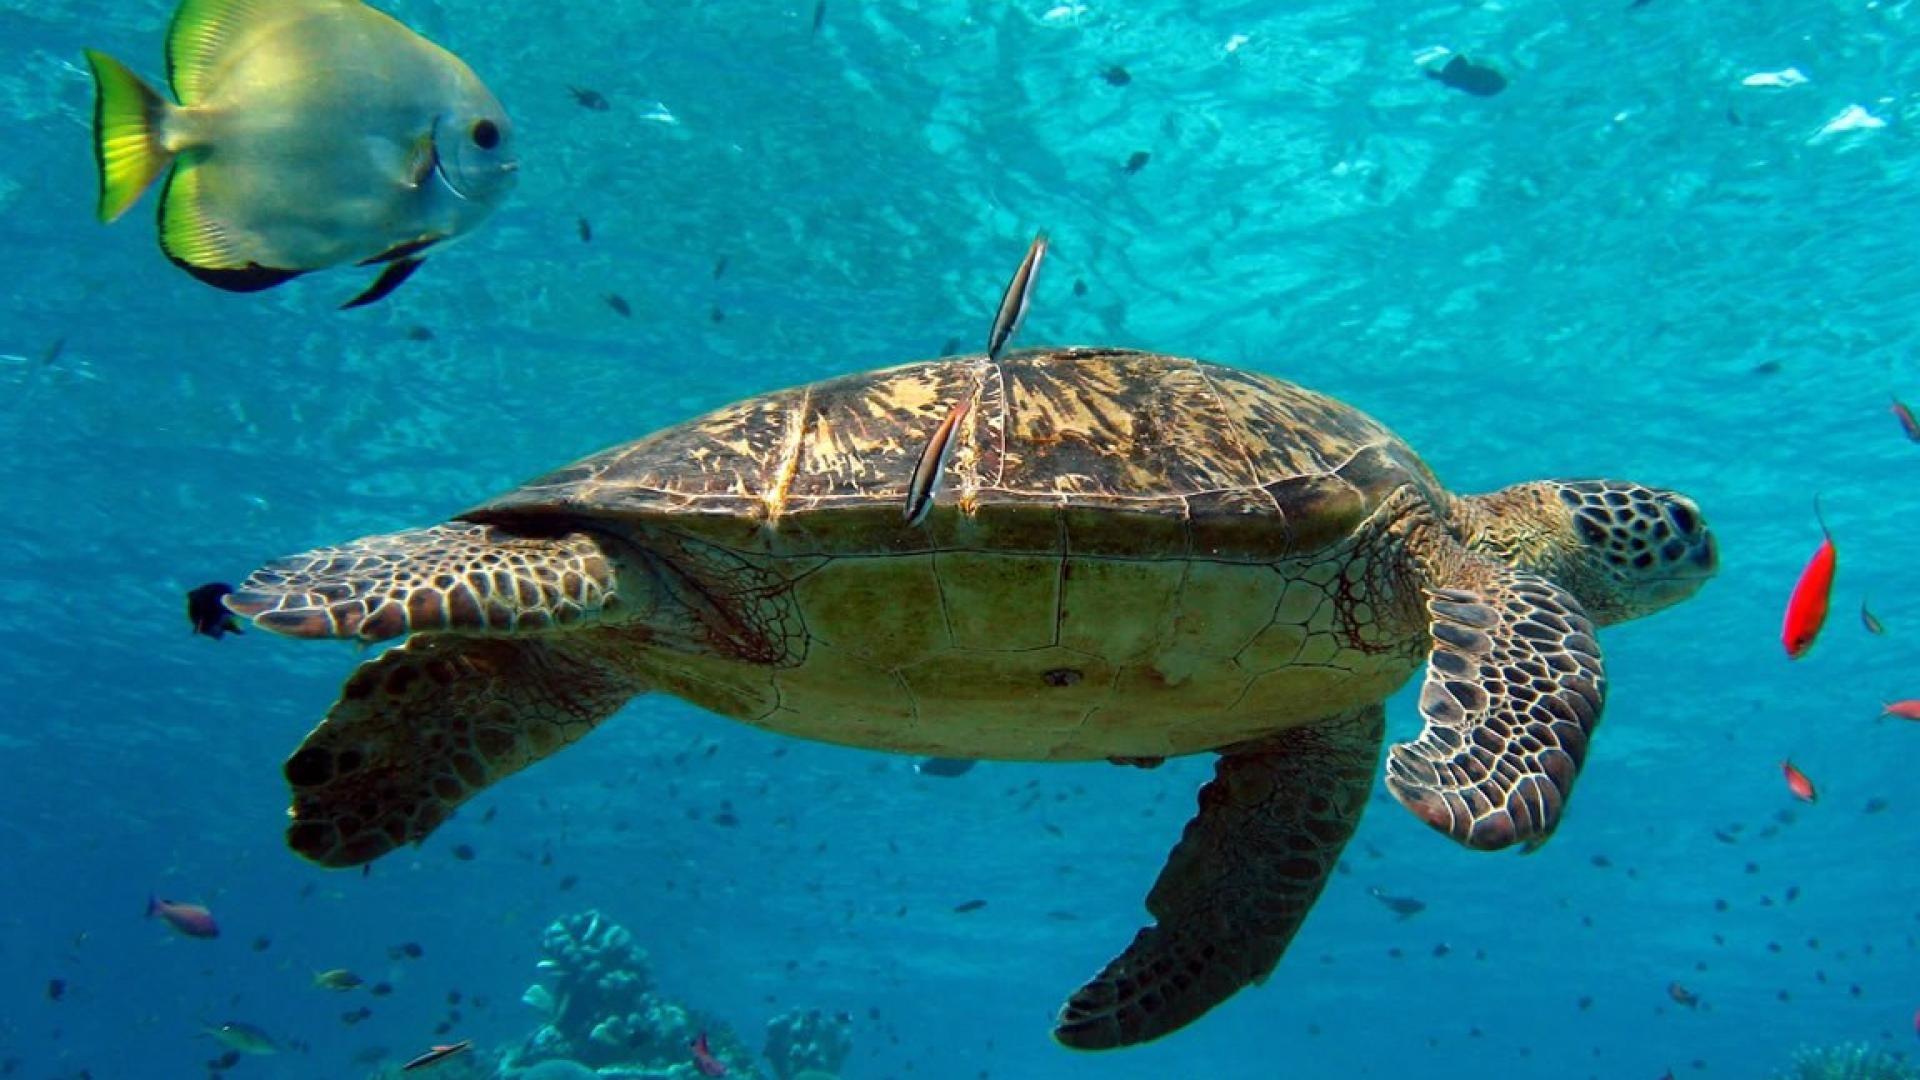 1920x1080_turtle-turtles-sea-animals-underwater-wild-nature-HD-Wallpaper.jpg  (1920×1080)   Turtles & Crocs   Pinterest   Sea turtles, Turtle and 3d …